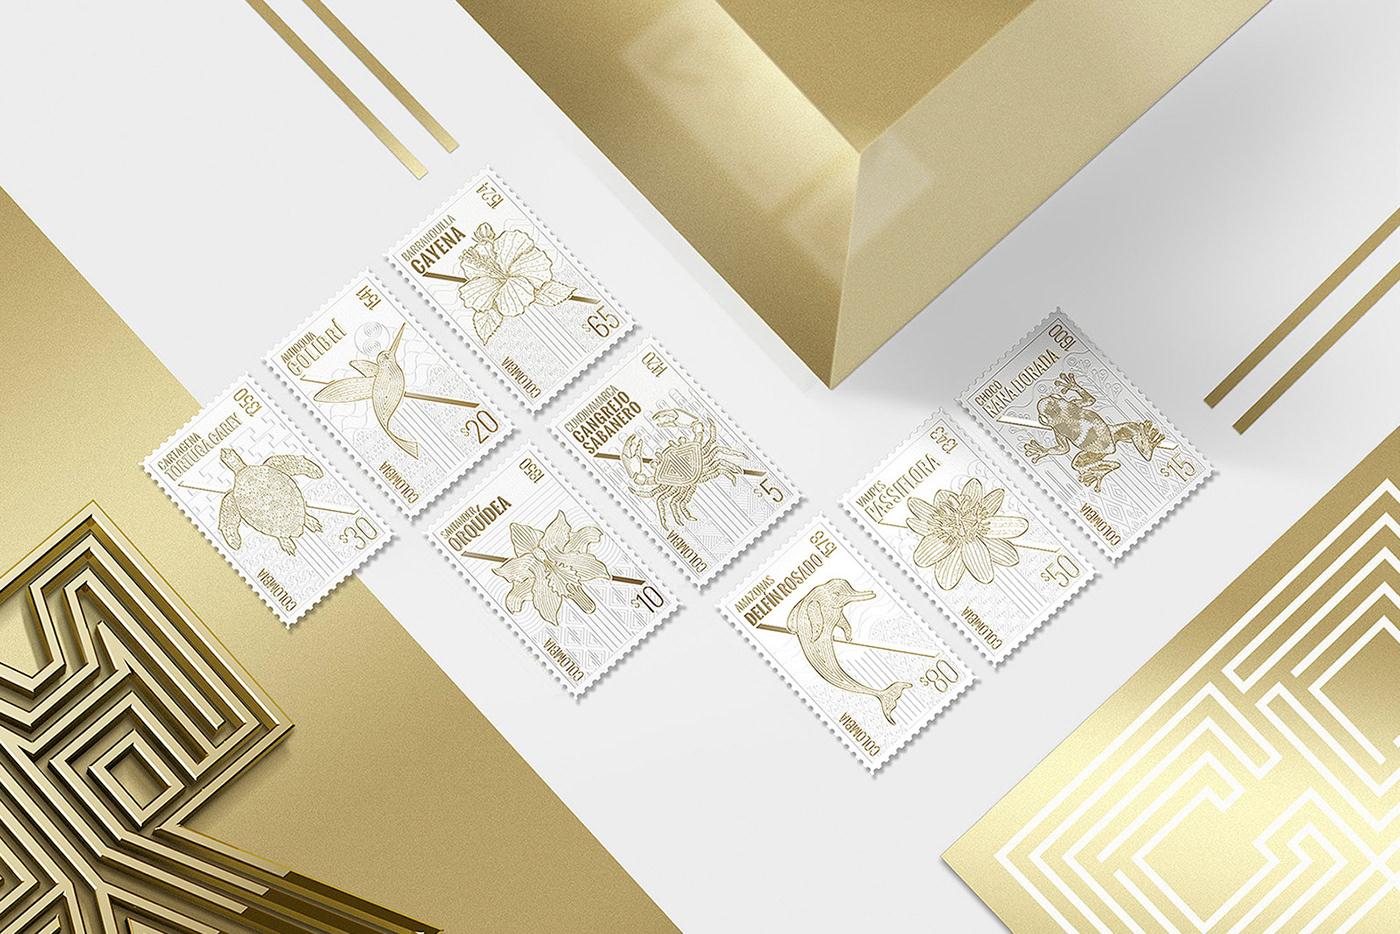 estampilla colombia animals stamp fauna Flora identity gold david espinosa